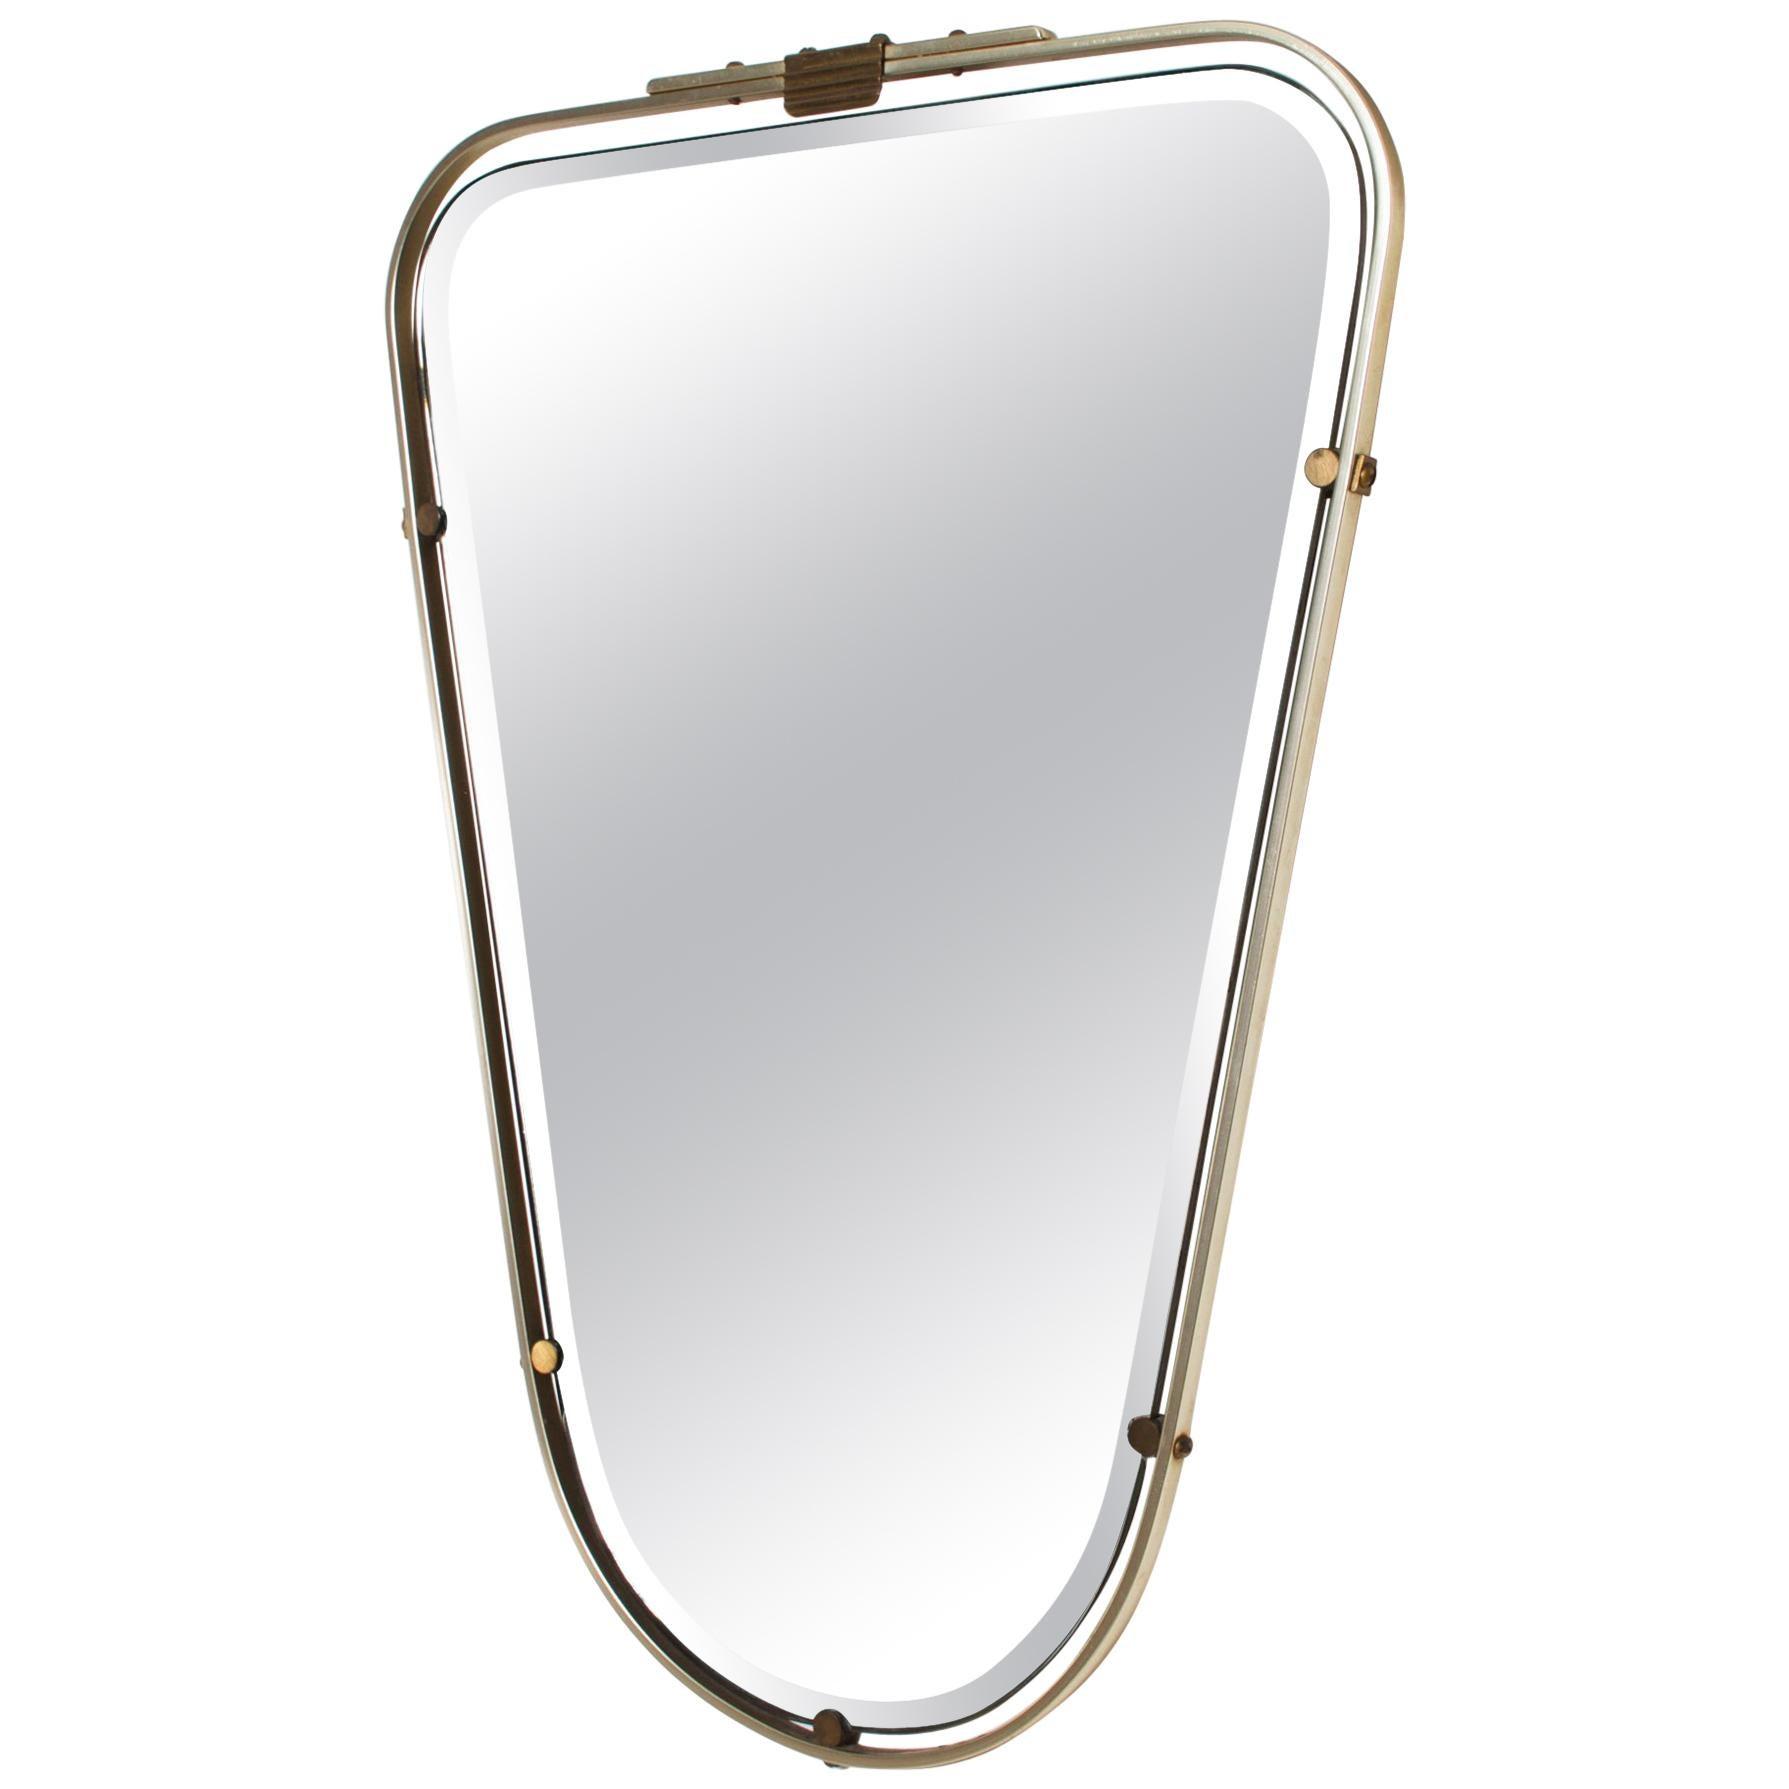 Fontana Arte Regency Elongated Wall Mirror Elegant Shield Style Gio Ponti 1950s